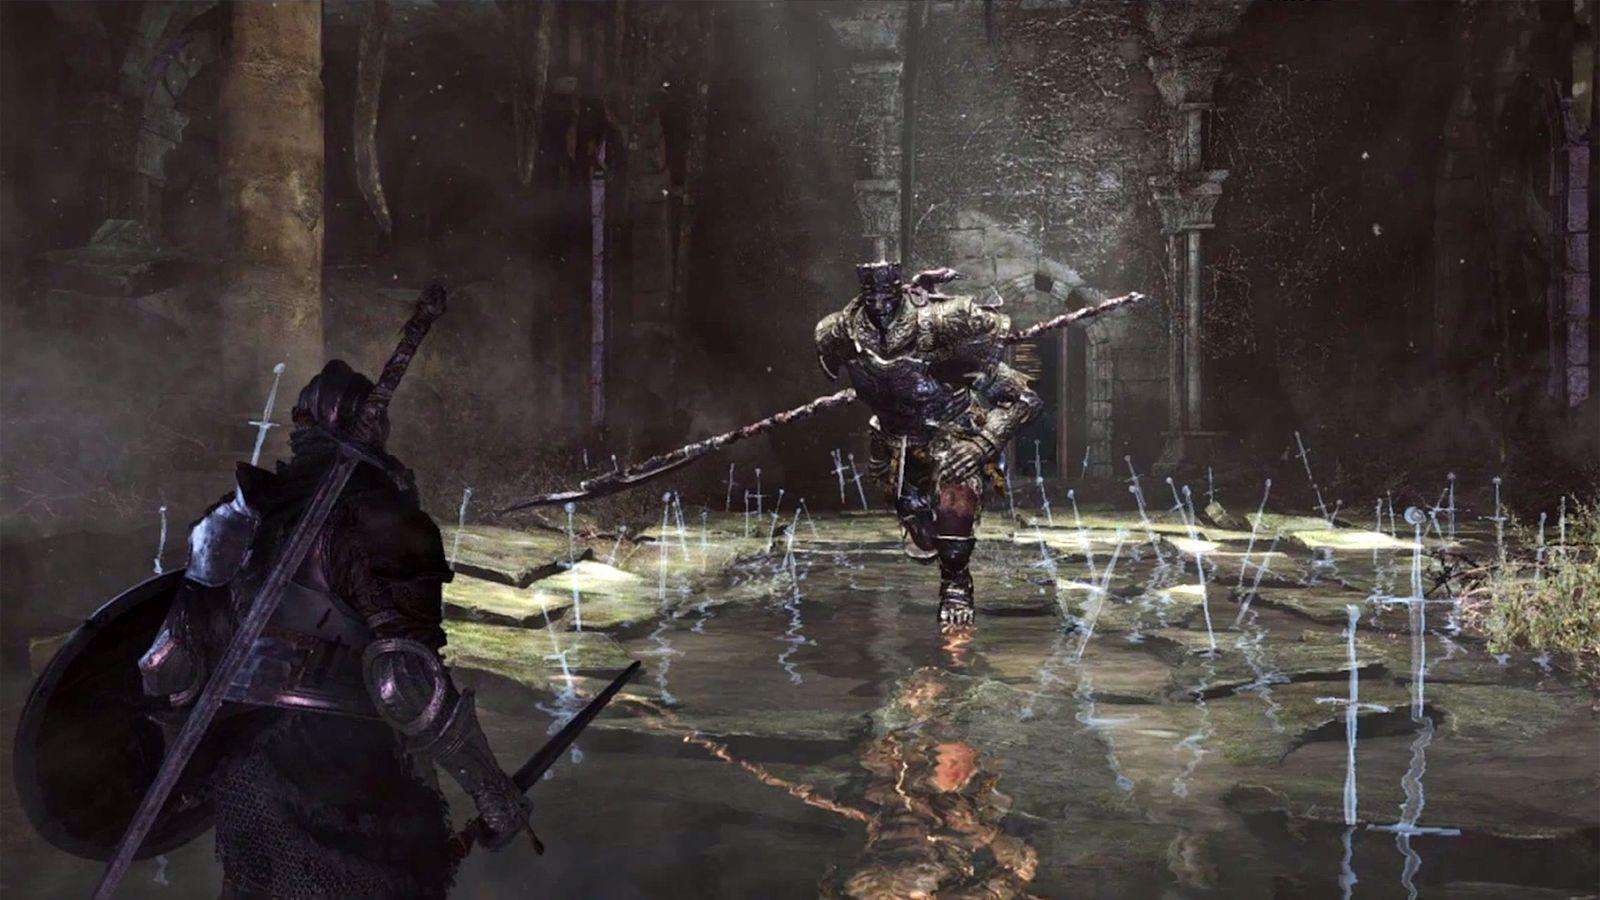 Dark Souls Ii Out Stunning Wallpapers High Quality: Dark Souls 3 Screenshots, Rumored Gameplay Details Leak